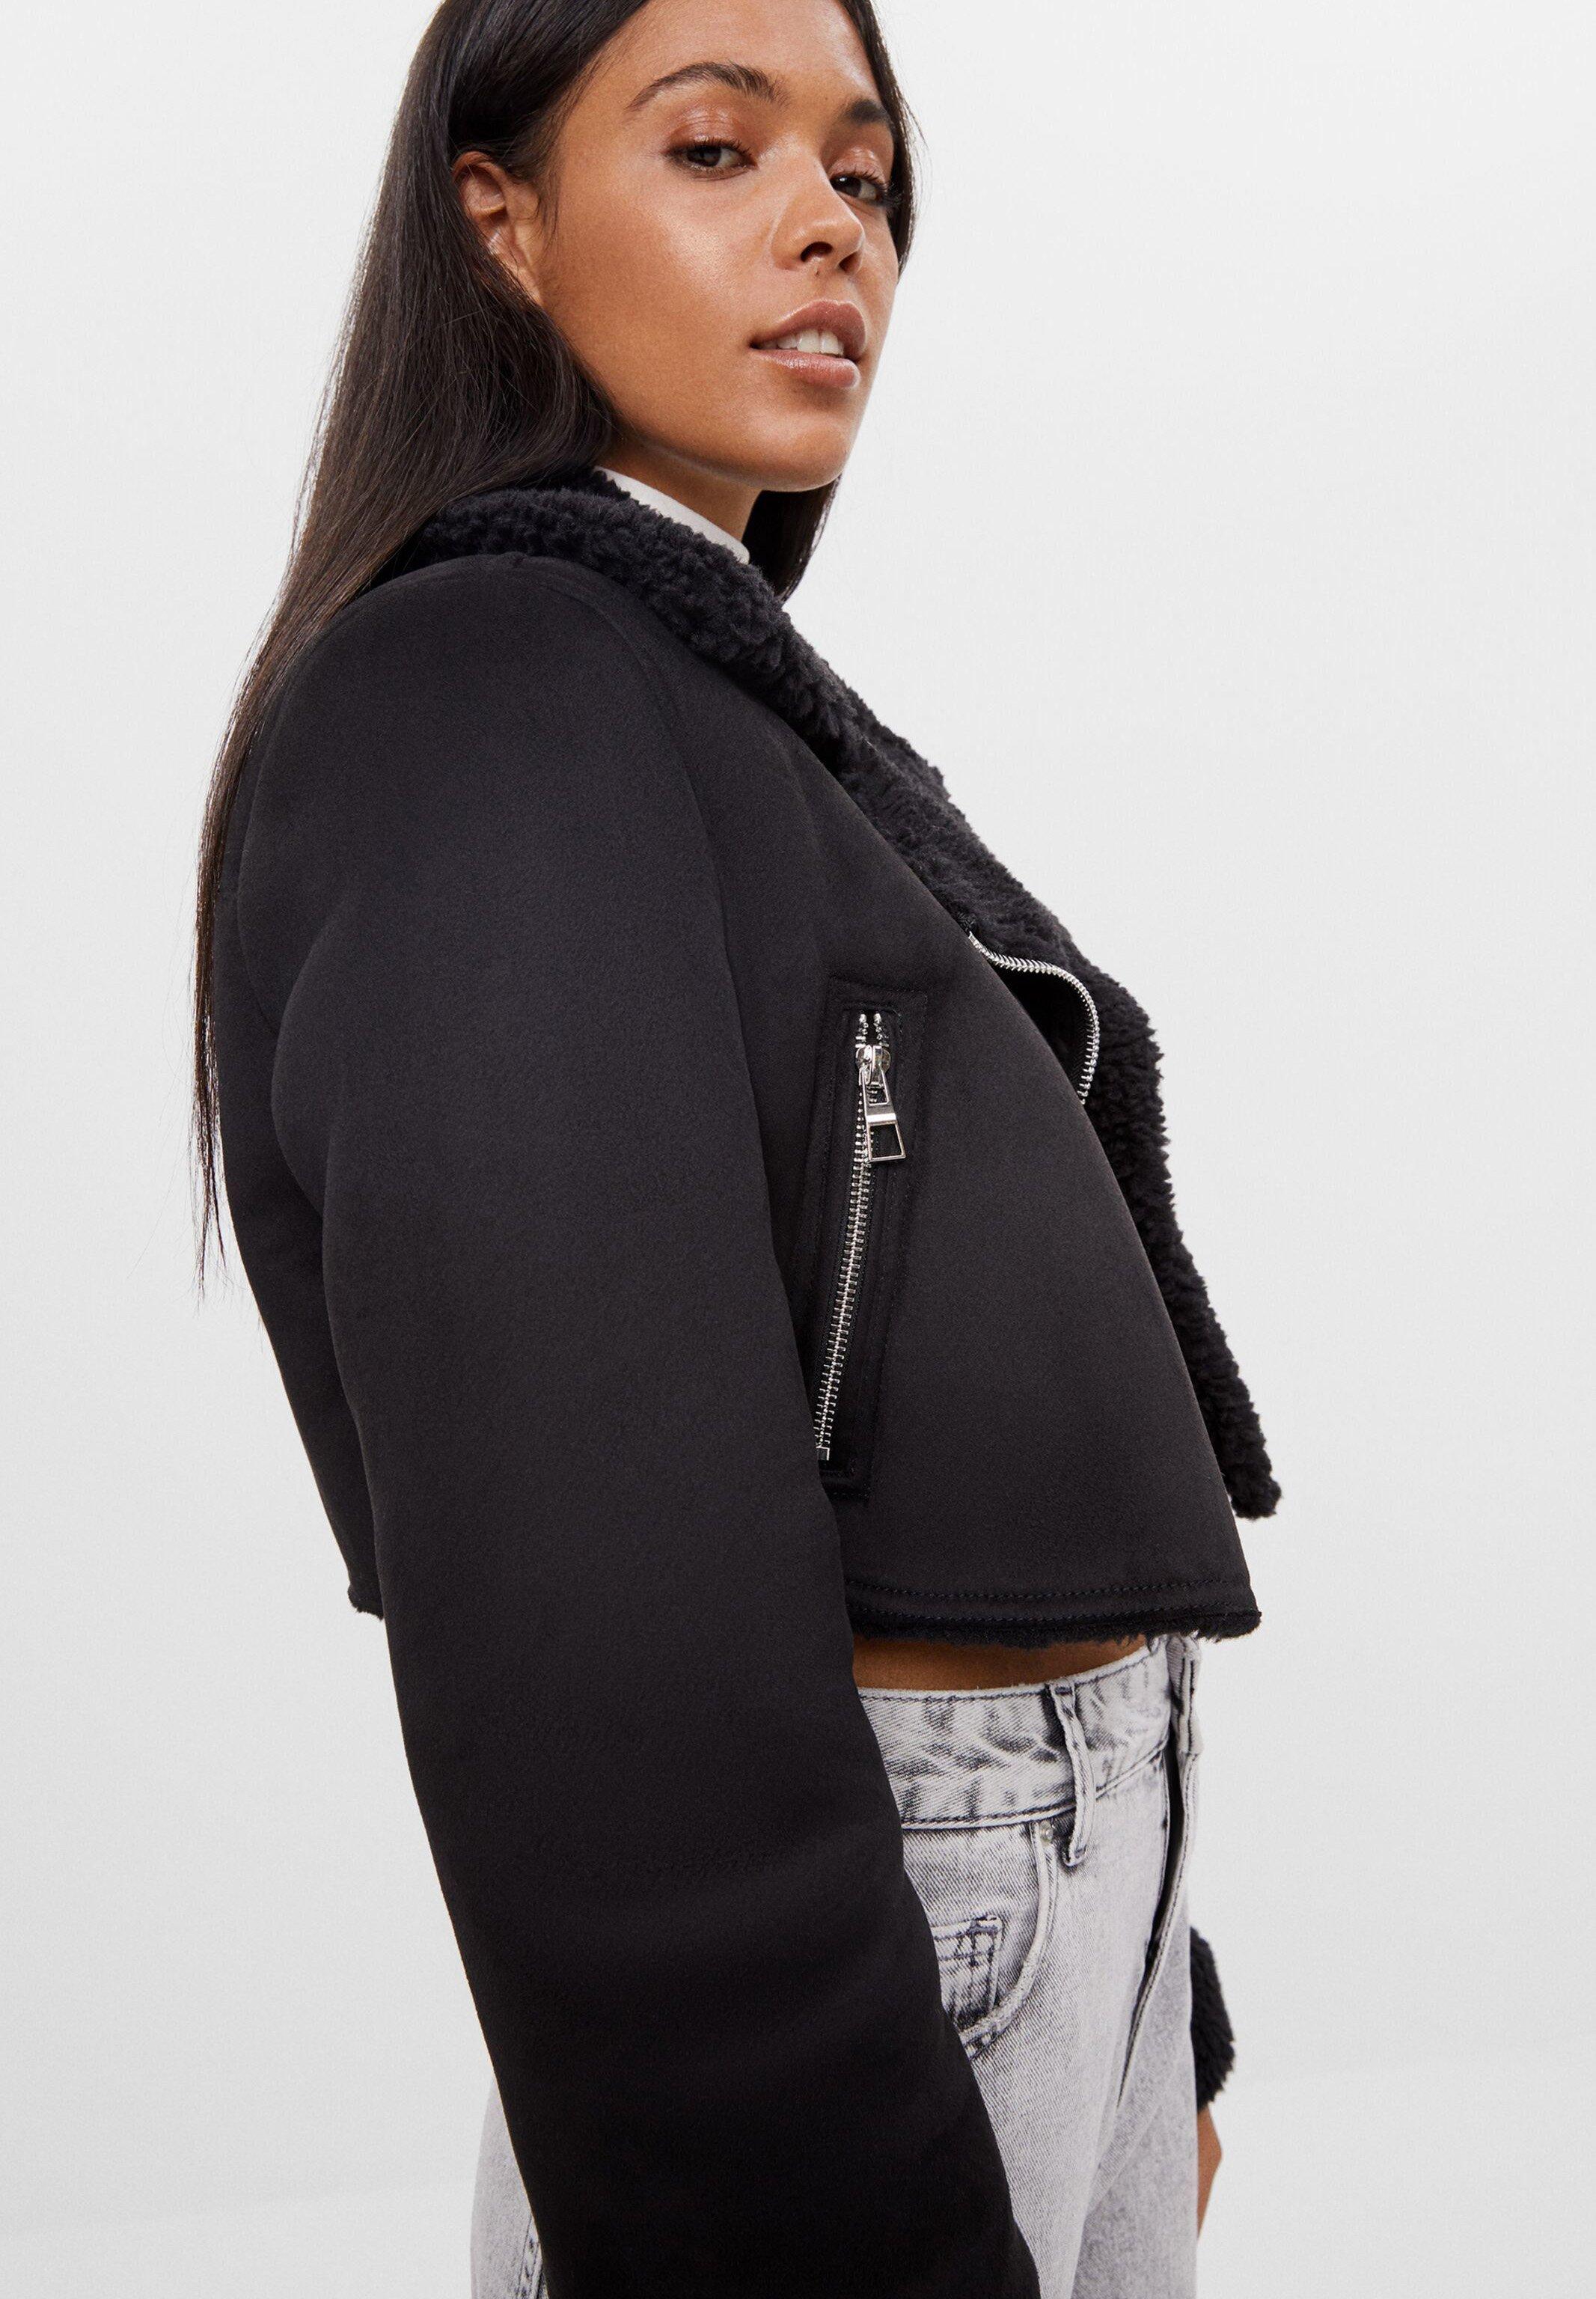 Bershka Cropped Doubleface Leather Jacket Black Zalando De